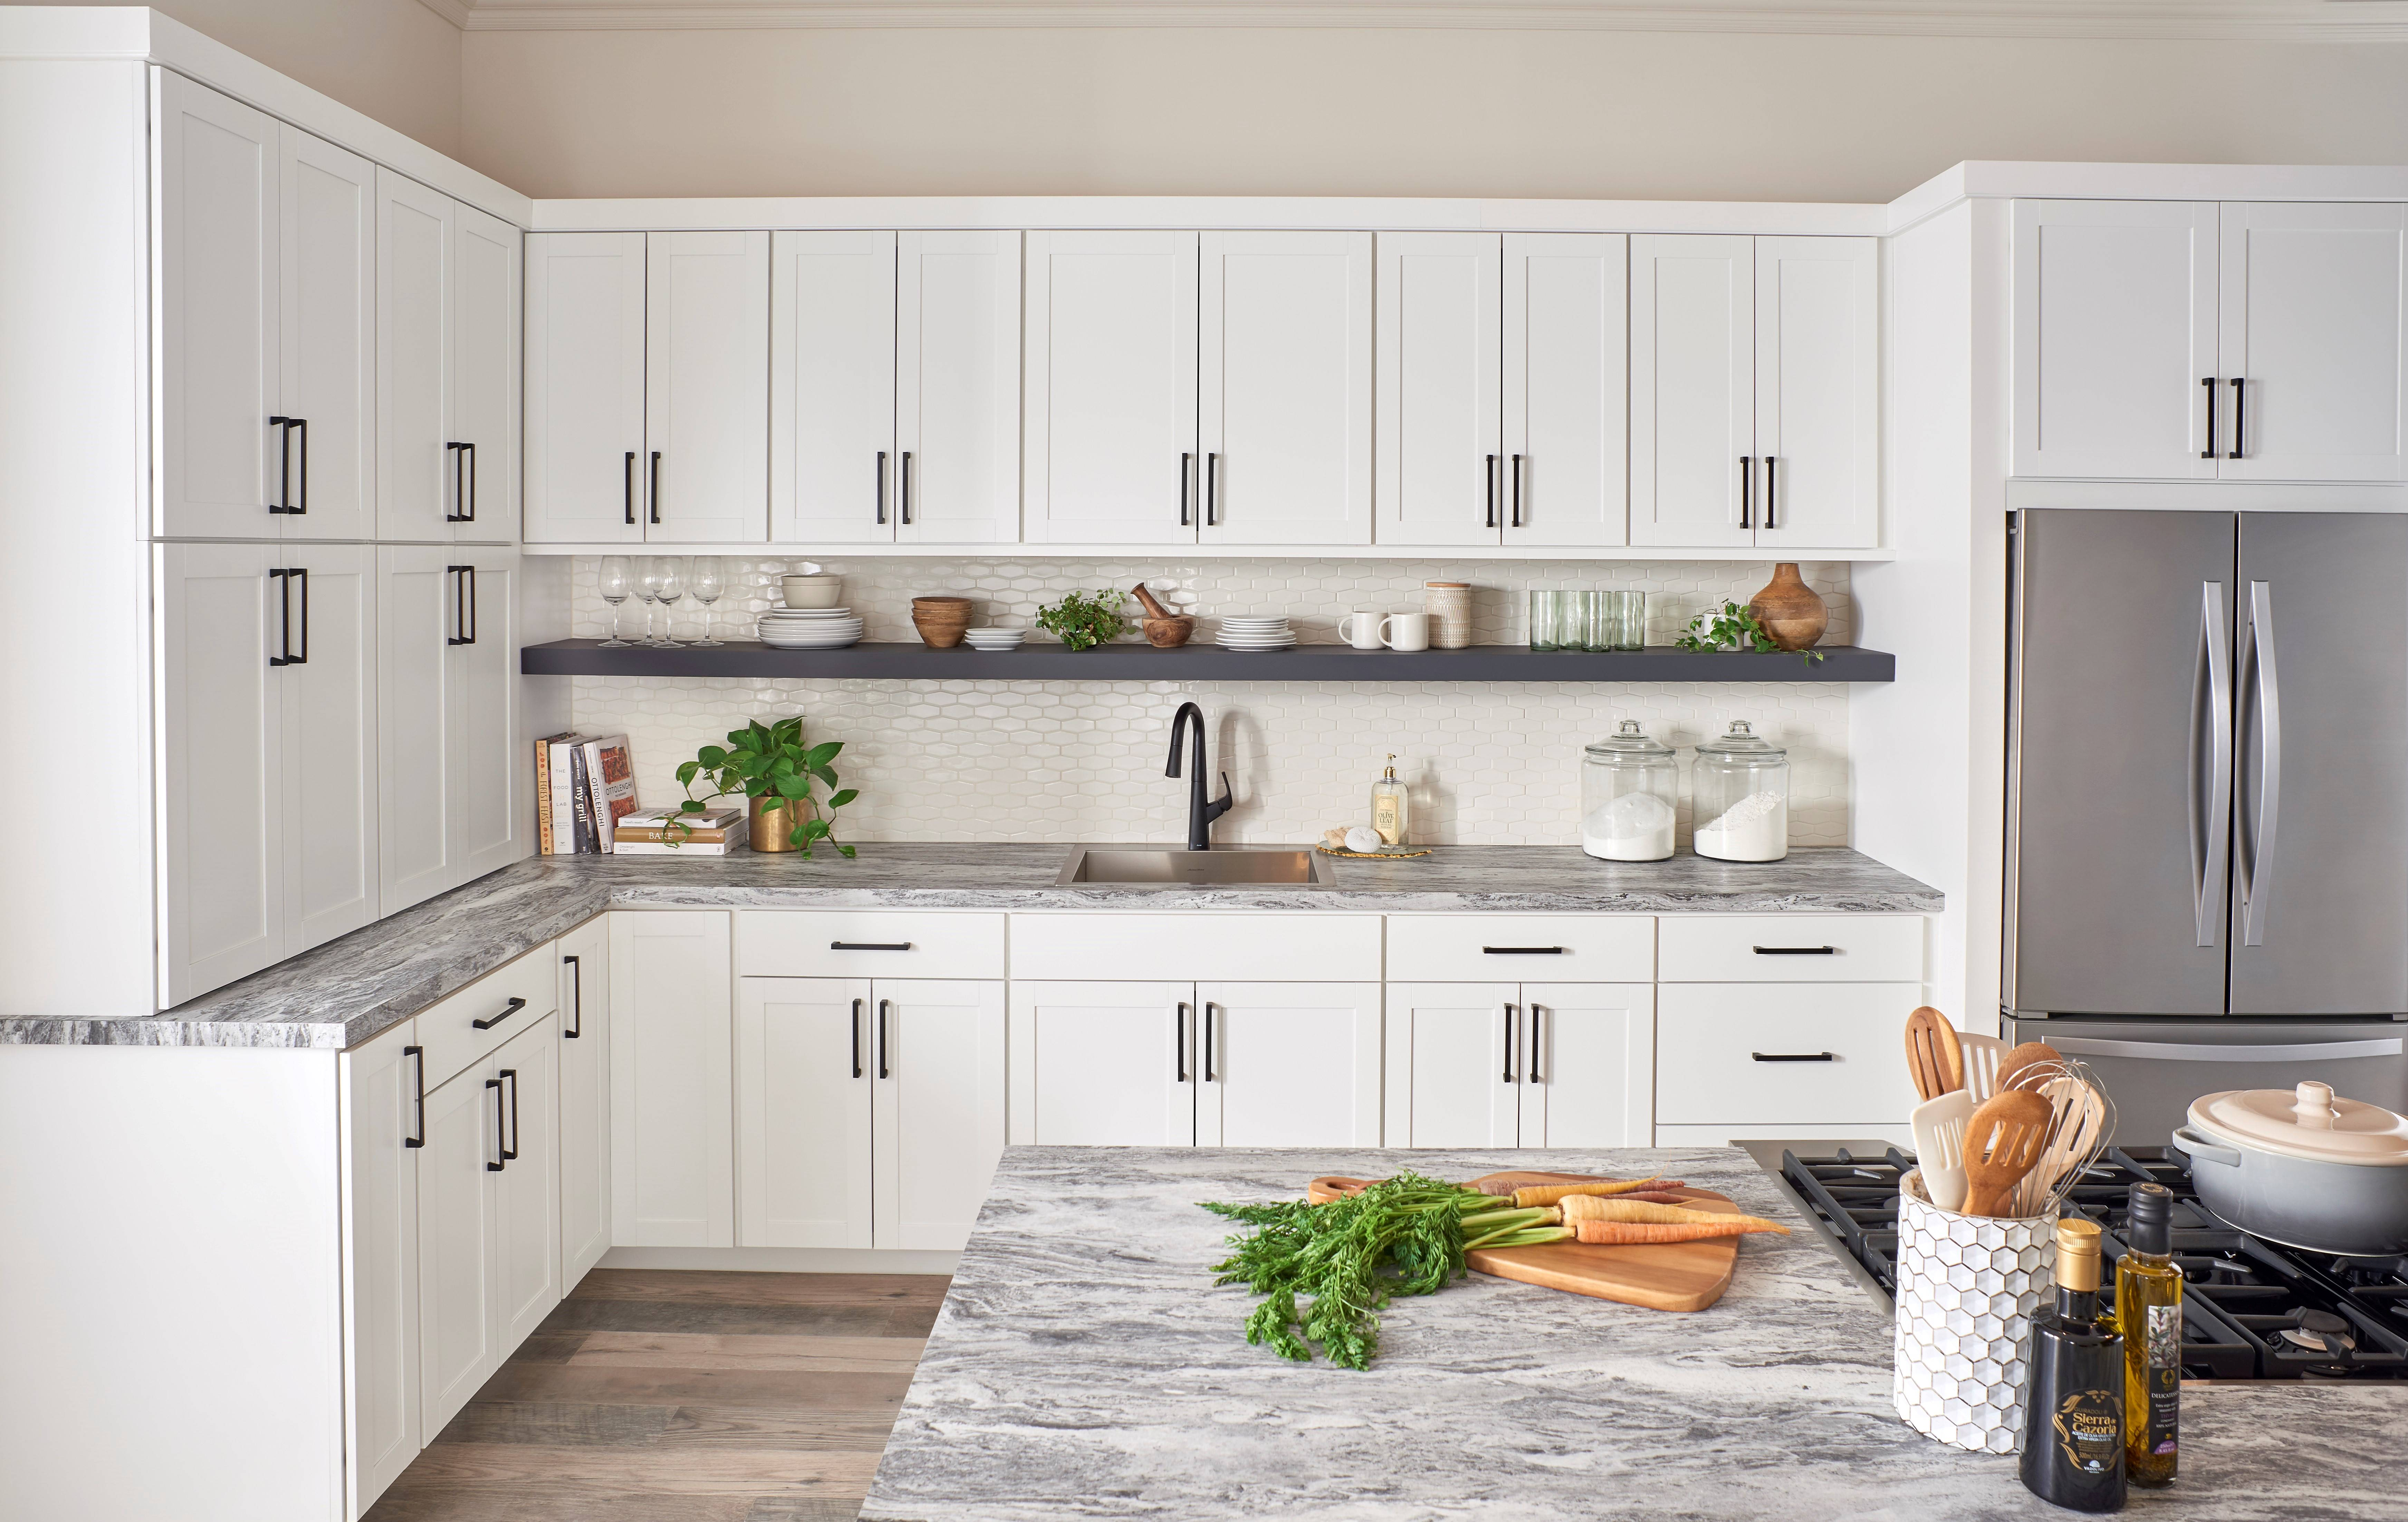 Assembled Kitchen Cabinets | Assembled Kitchen Cabinets ...